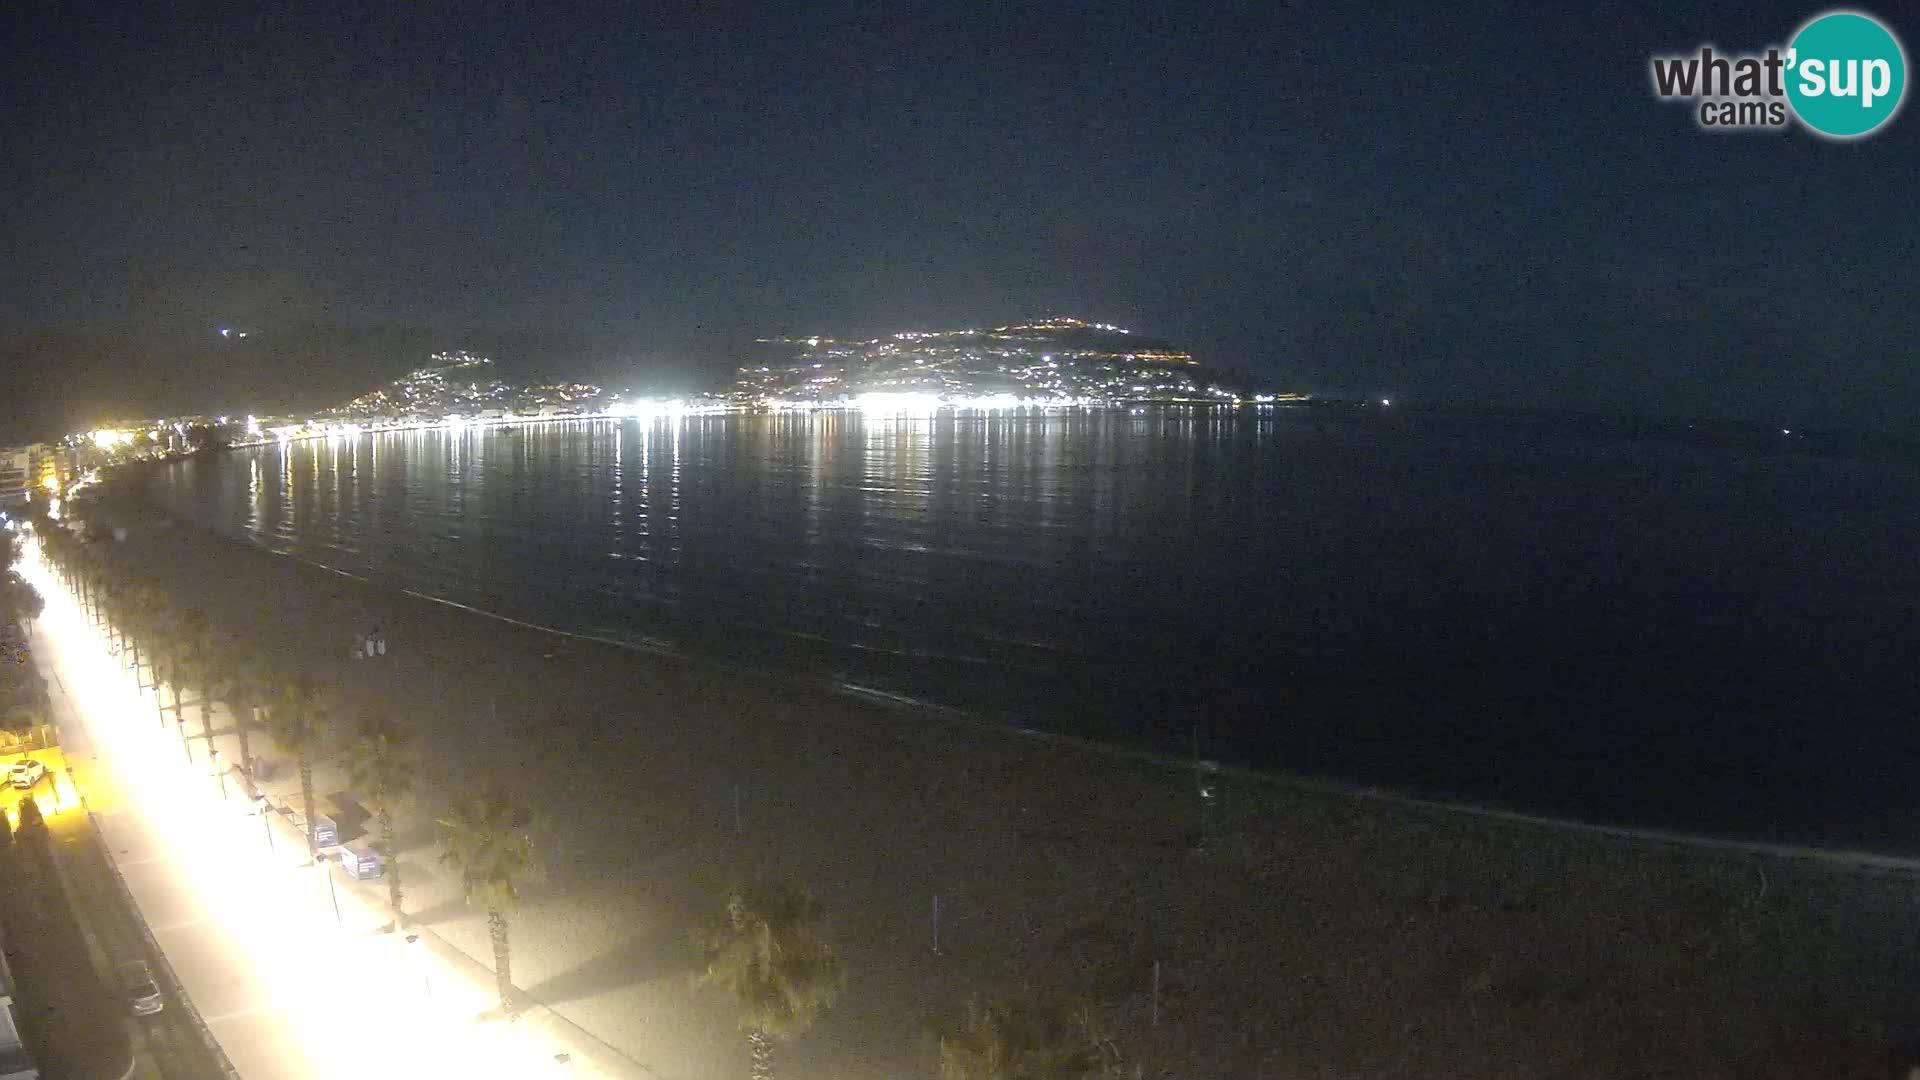 LIVEcam Roses plage Costa Brava – Hotel Montecarlo webcam Espagne